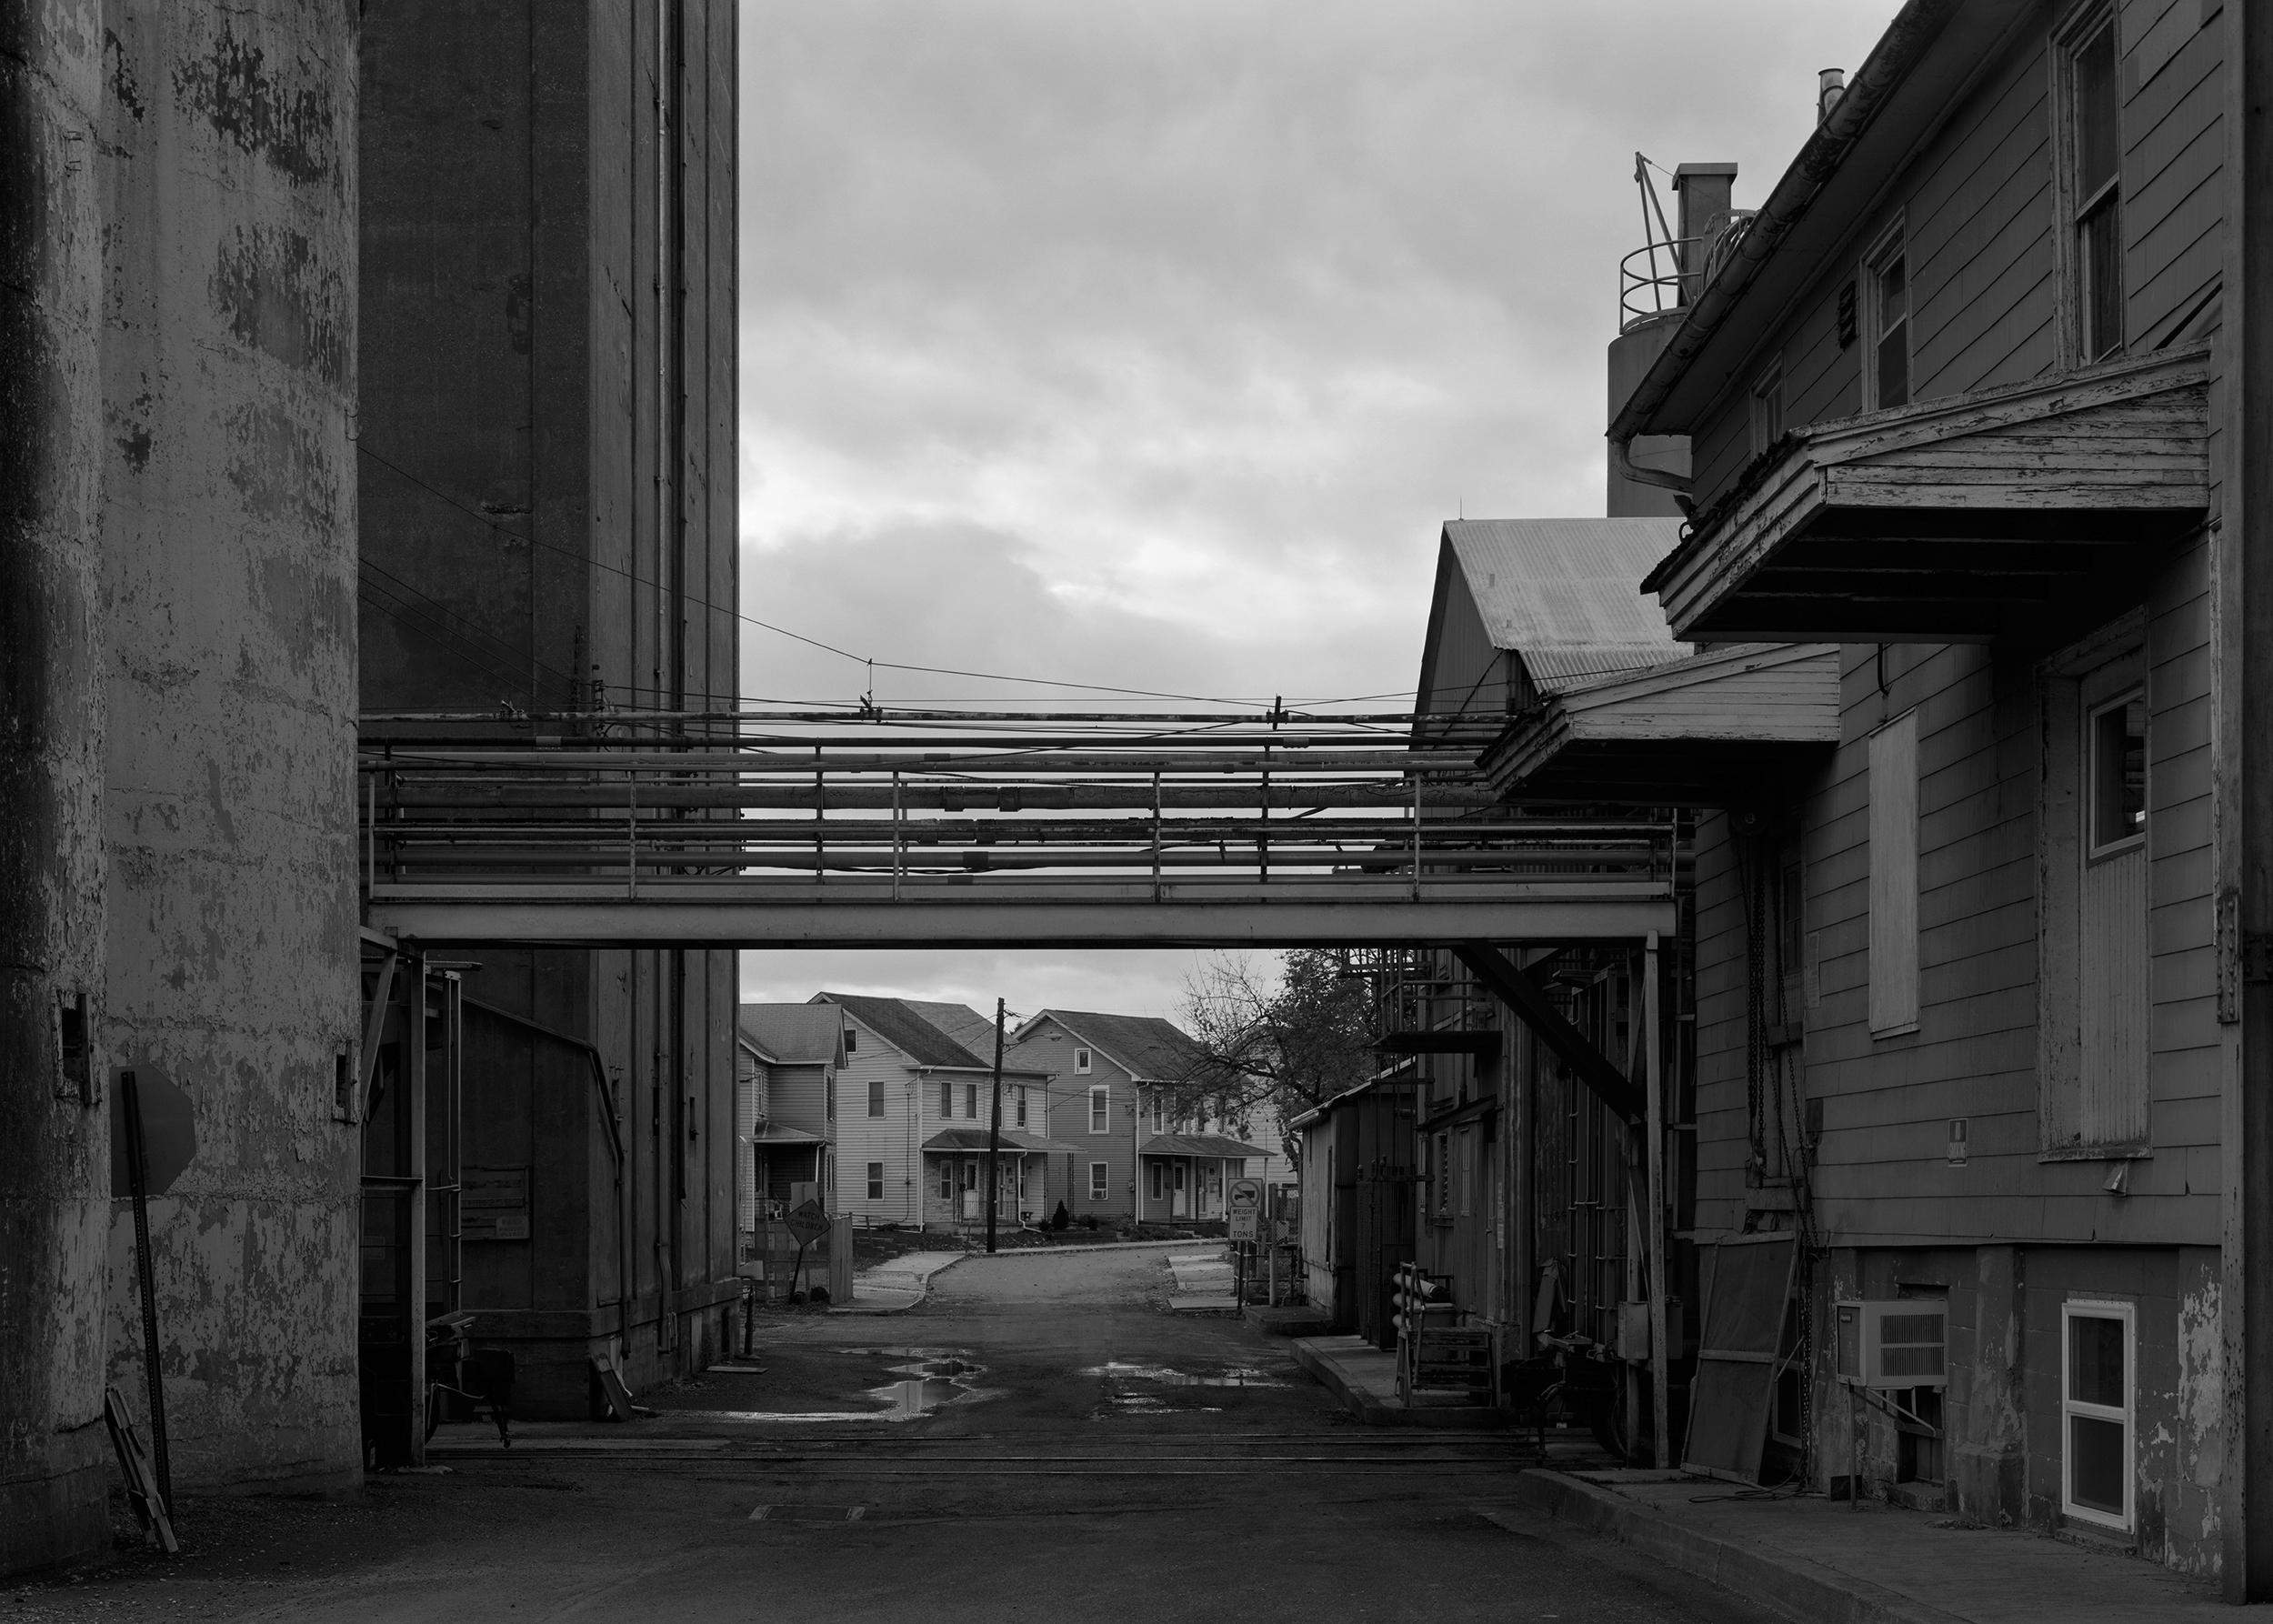 Westward View from Jury Street, Highspire, Pennsylvania